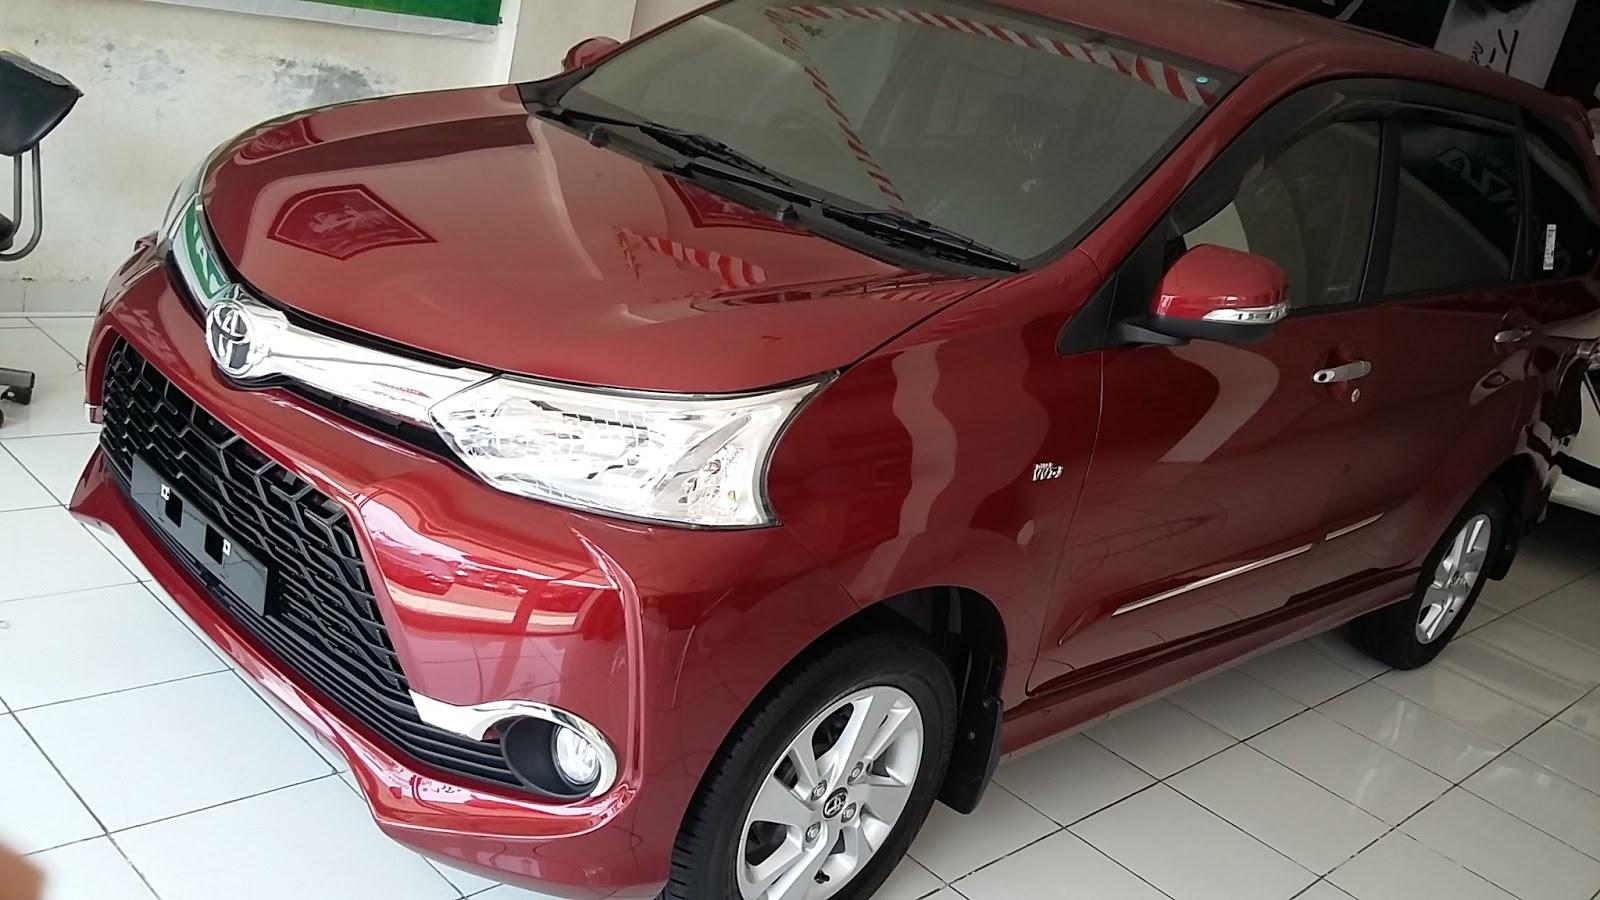 Grand New Avanza Merah All Vellfire 2017 Toyota Online Jakarta Bekasi Paket Kredit Mei 2016 Sambut Ramadhan Bersama Keluarga Anda Ajukan Sekarang Sebelum Harga Naik Di Bulan Info Lebih Lanjut Hubungi Call 0896 6011 9710